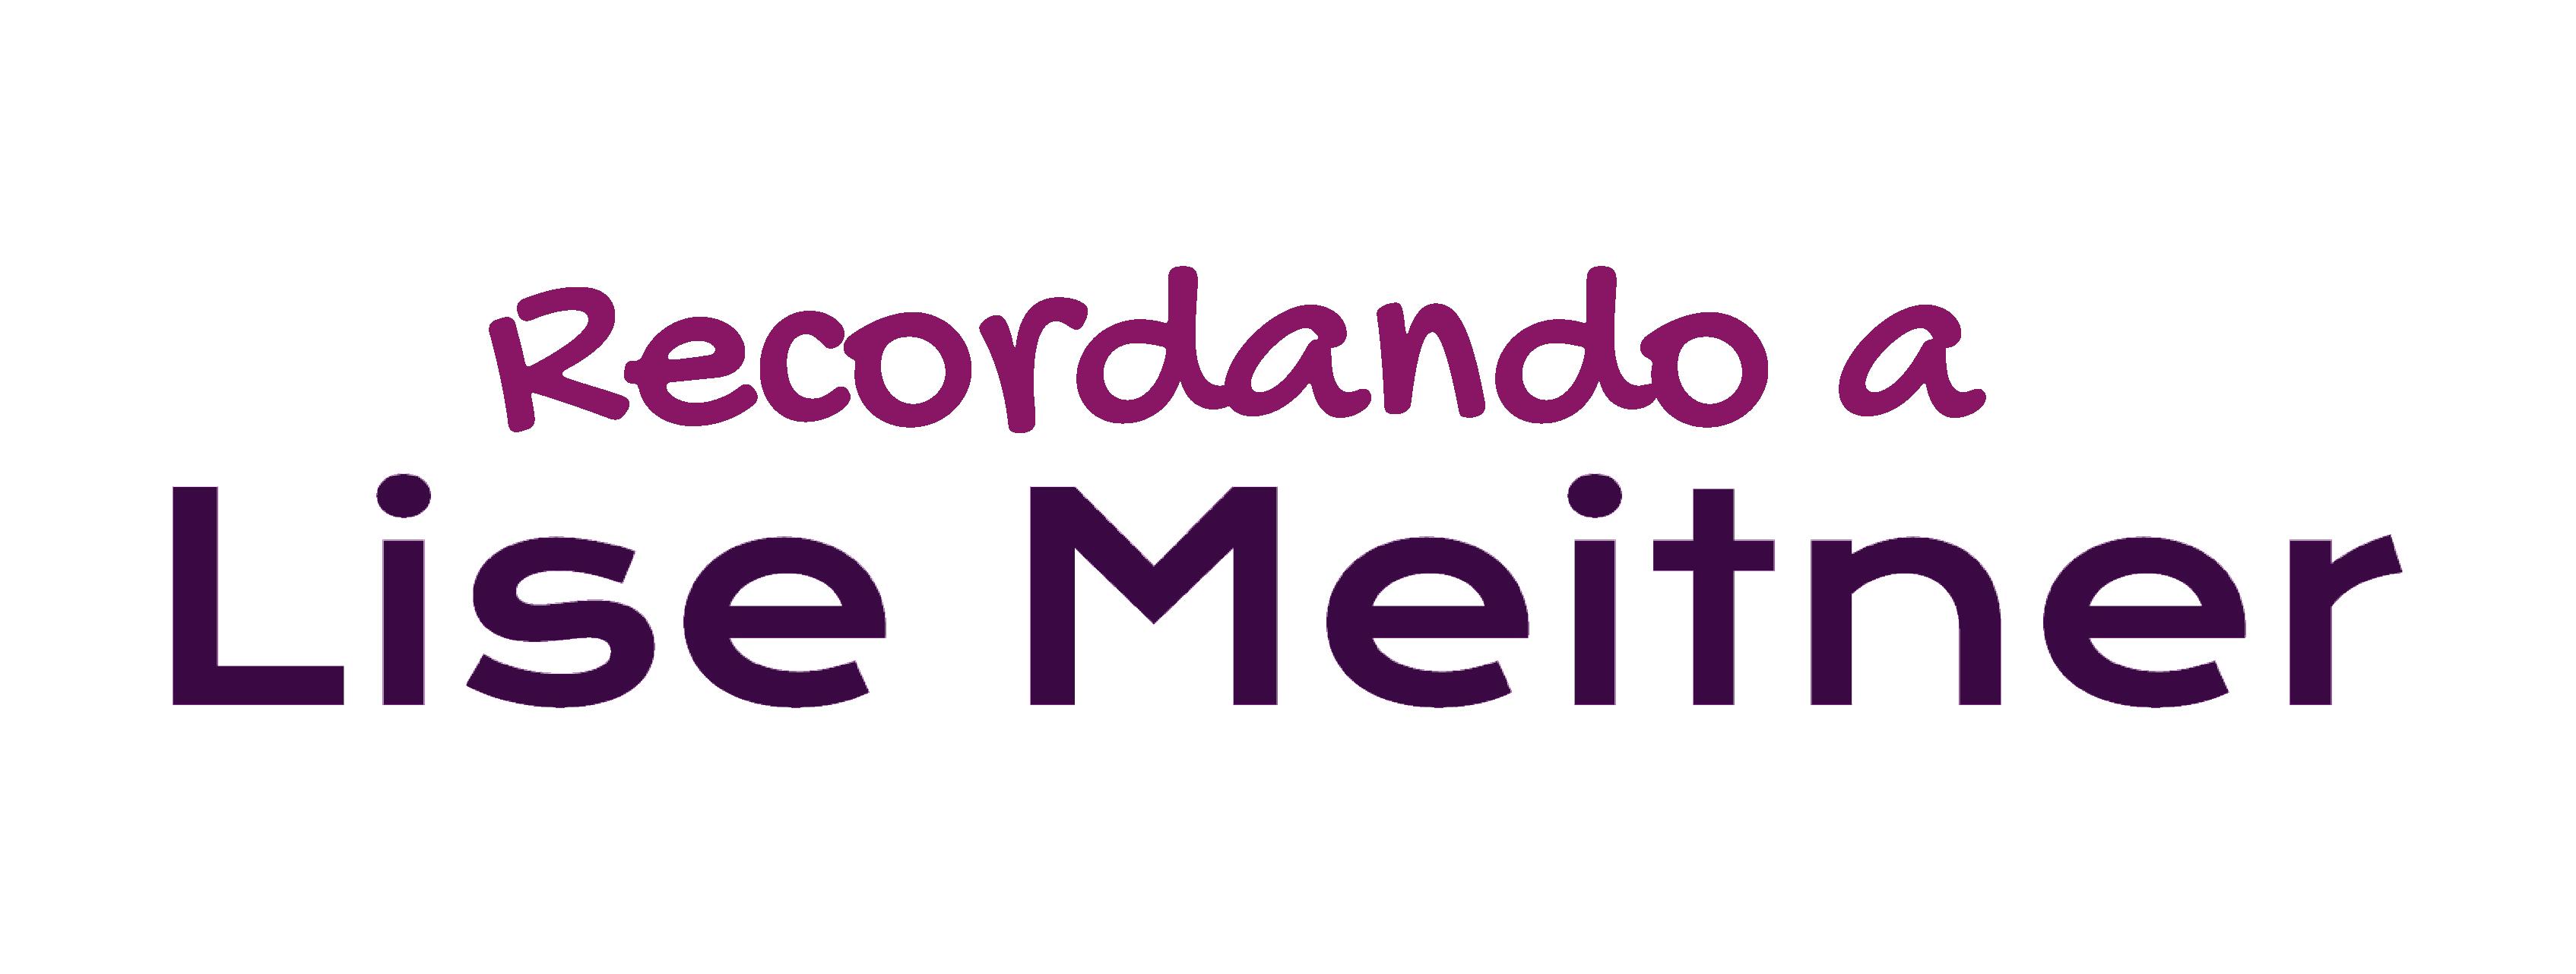 Proyecto Meitner